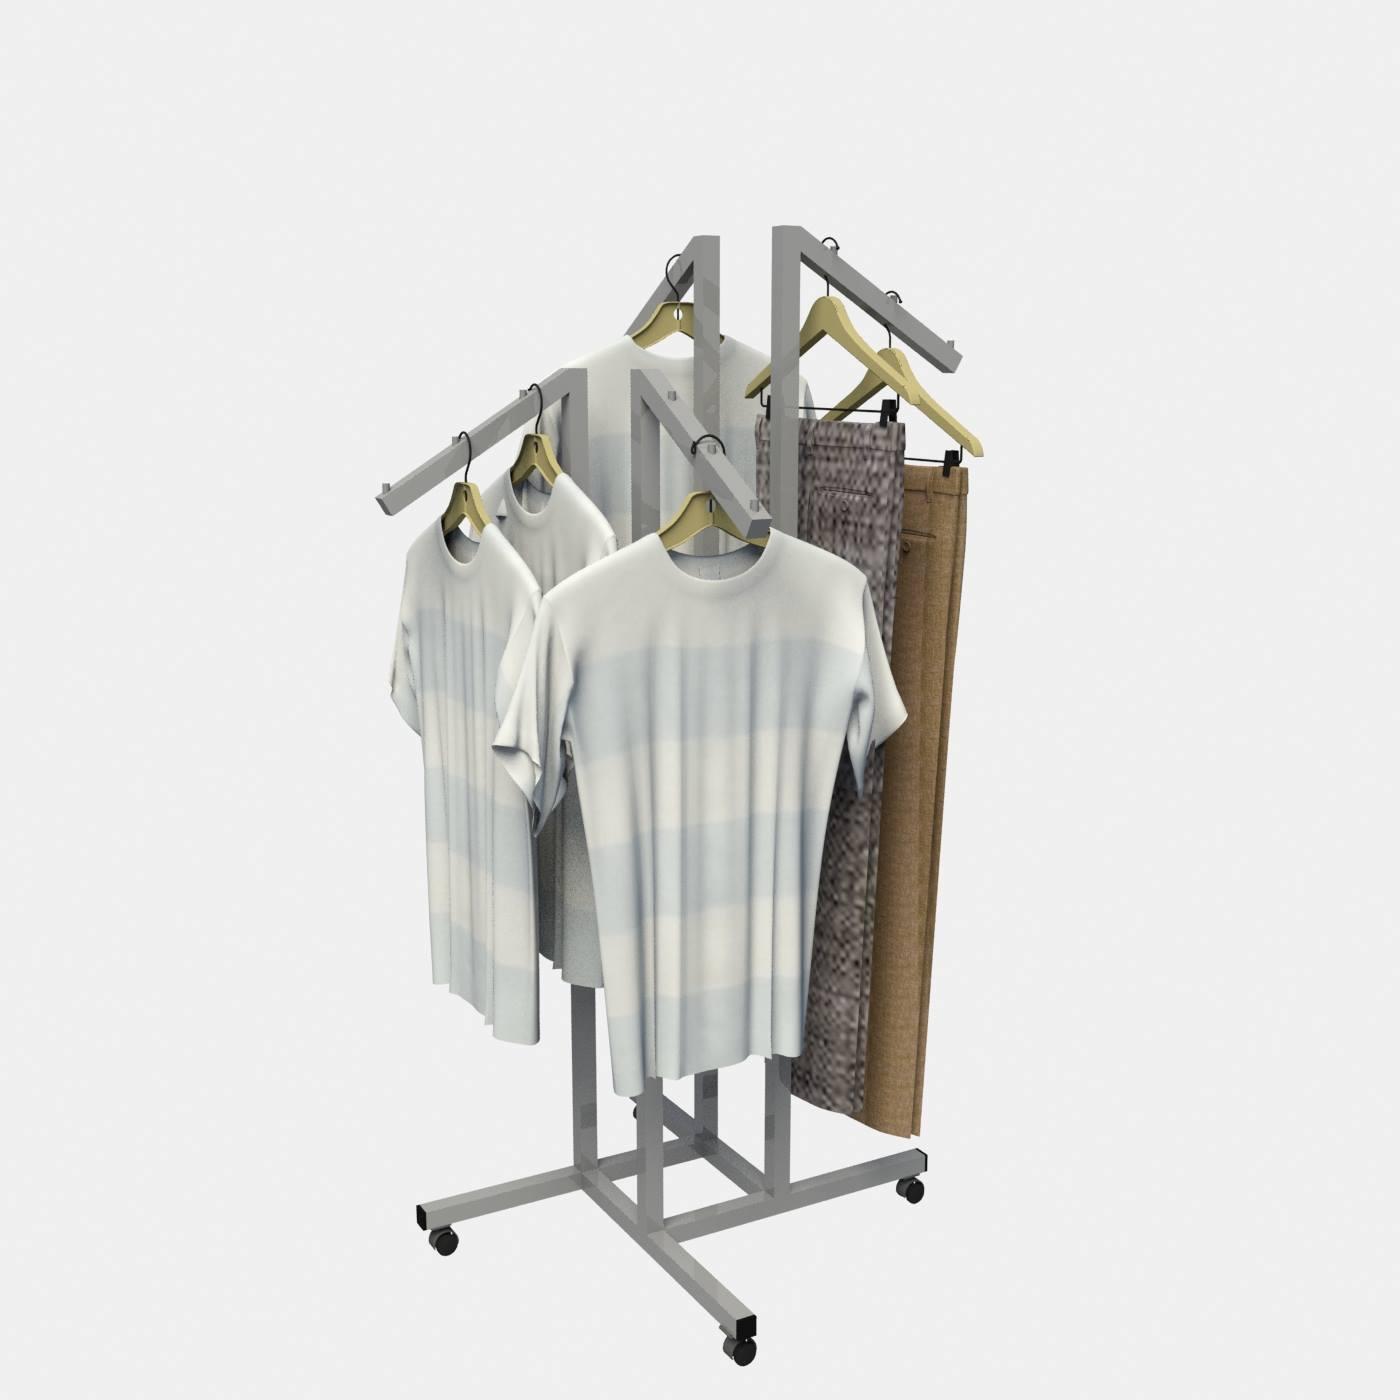 aac17cb90ea Καλόγερος σταντ ρούχων έπιπλα εξοπλισμός καταστημάτων επιπλώσεις  καταστήματος